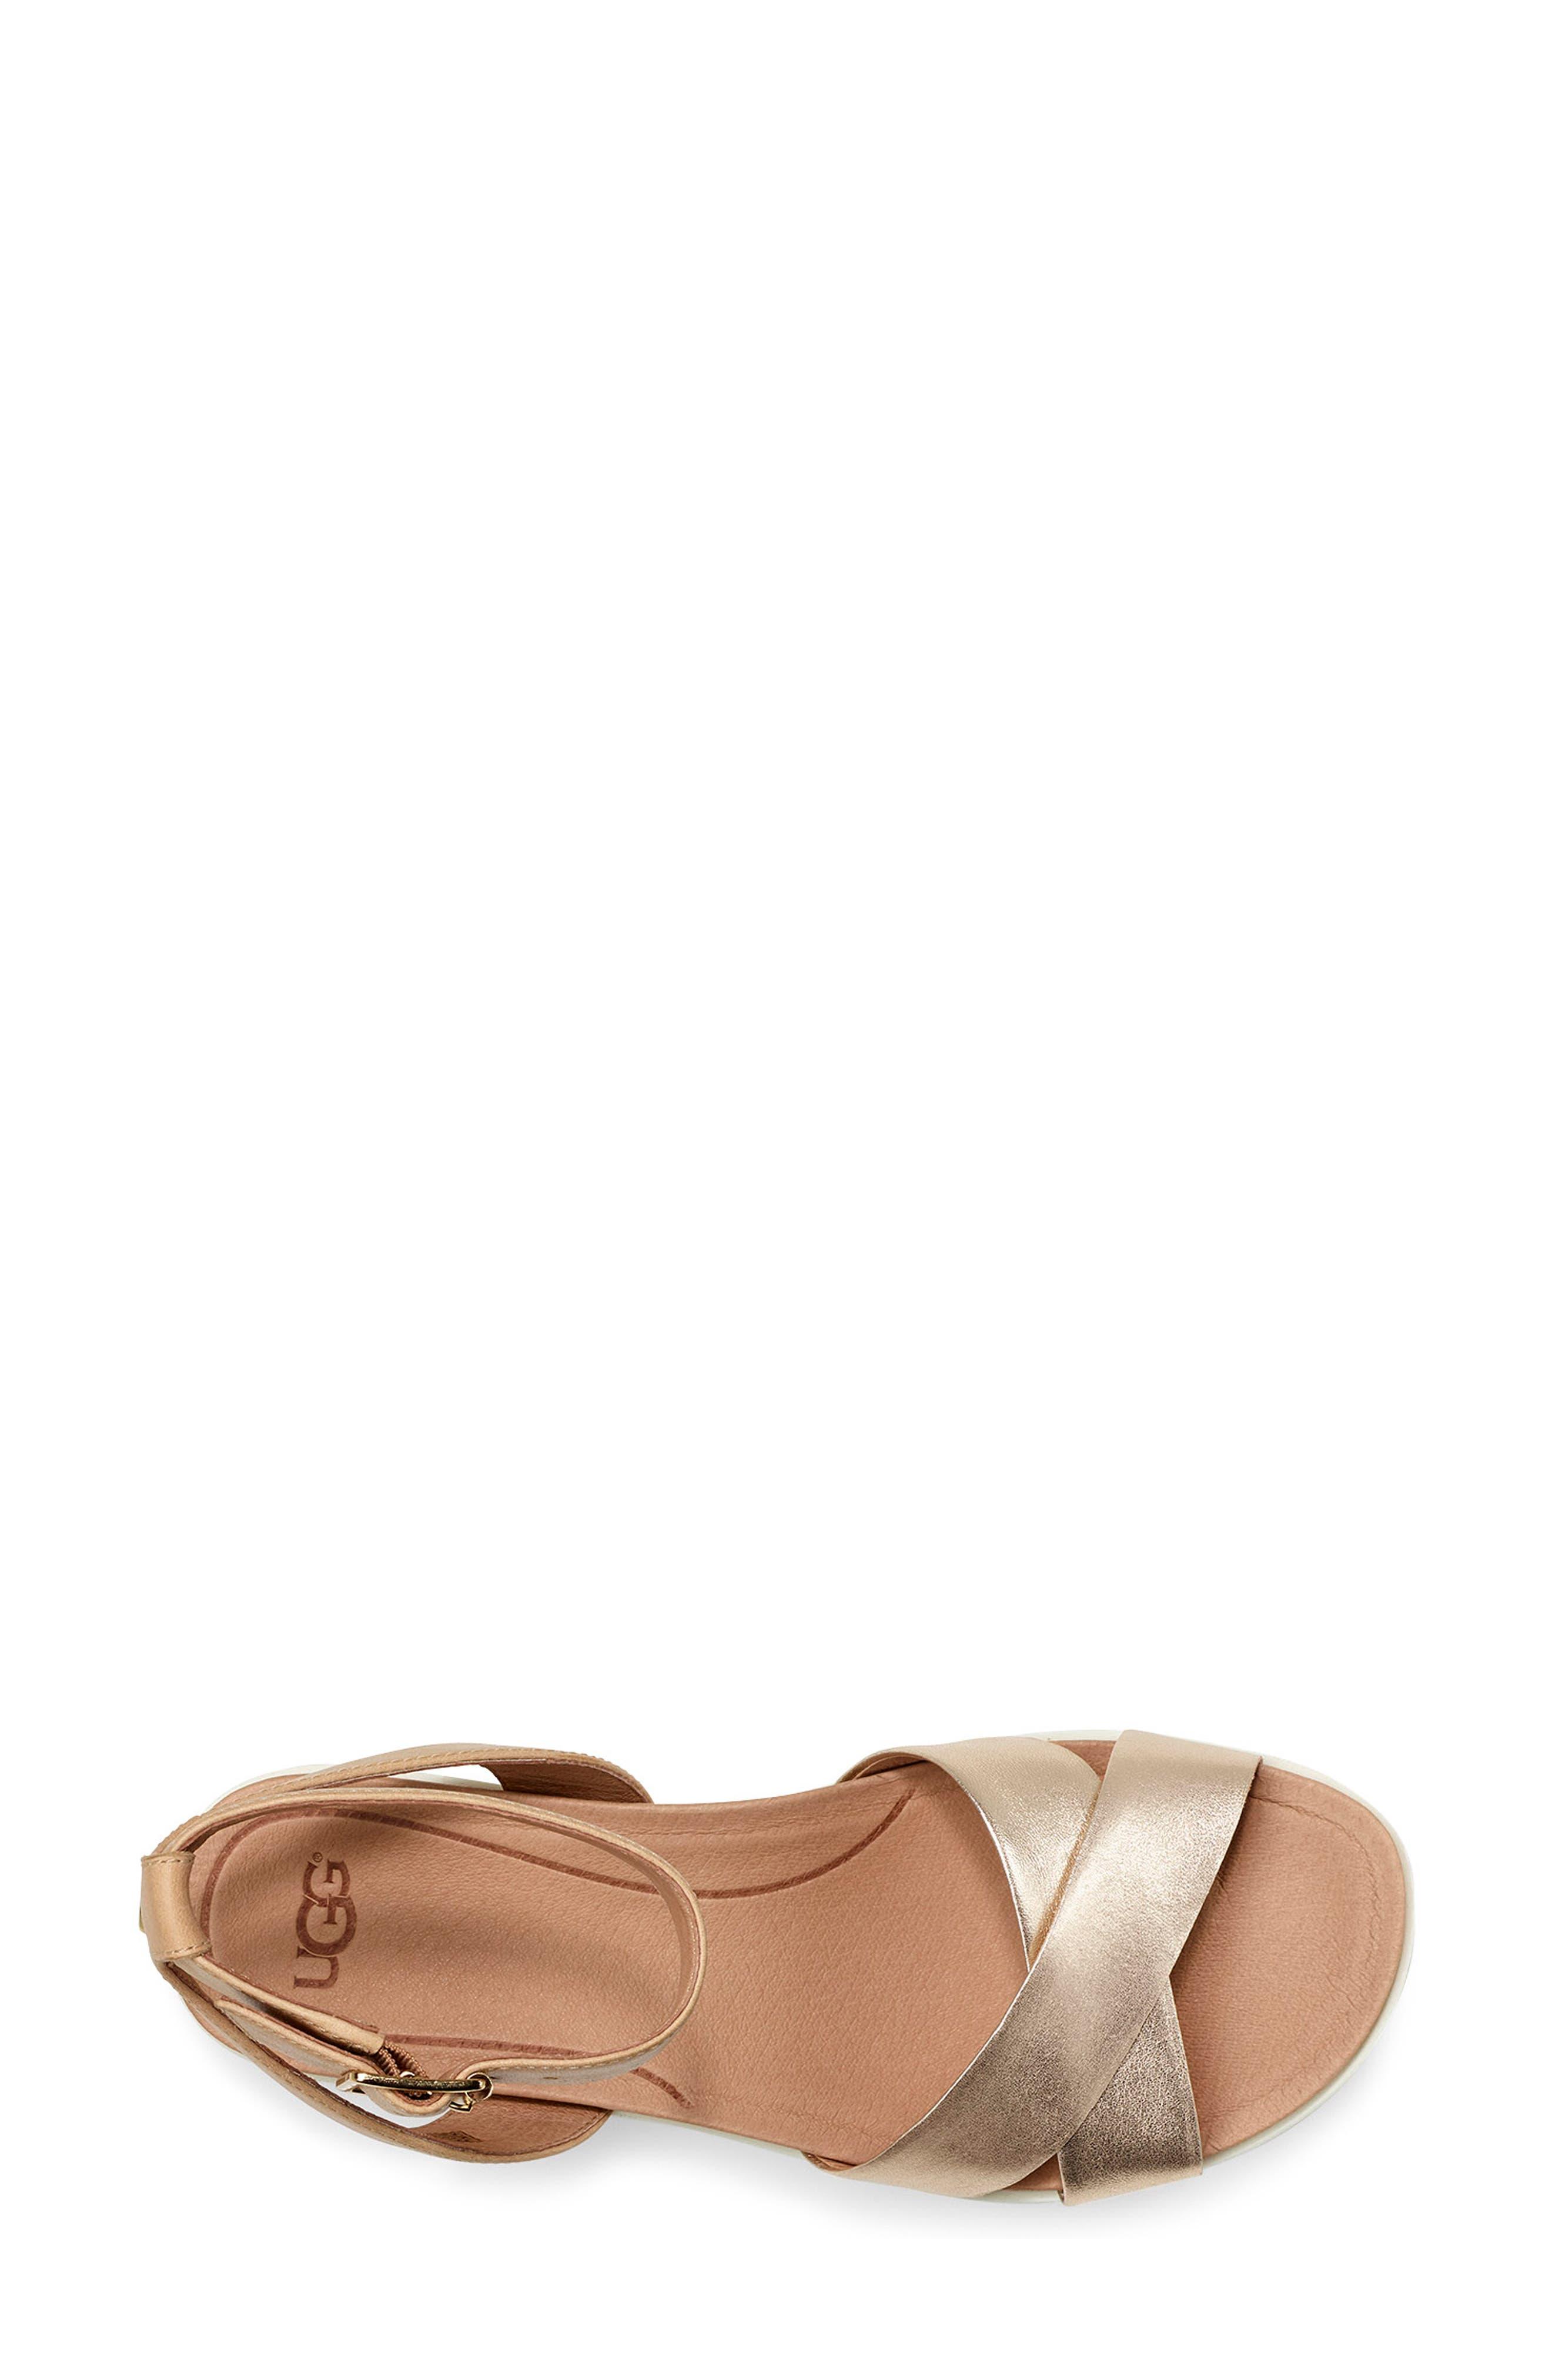 Tipton Metallic Platform Sandal,                             Alternate thumbnail 4, color,                             GOLD